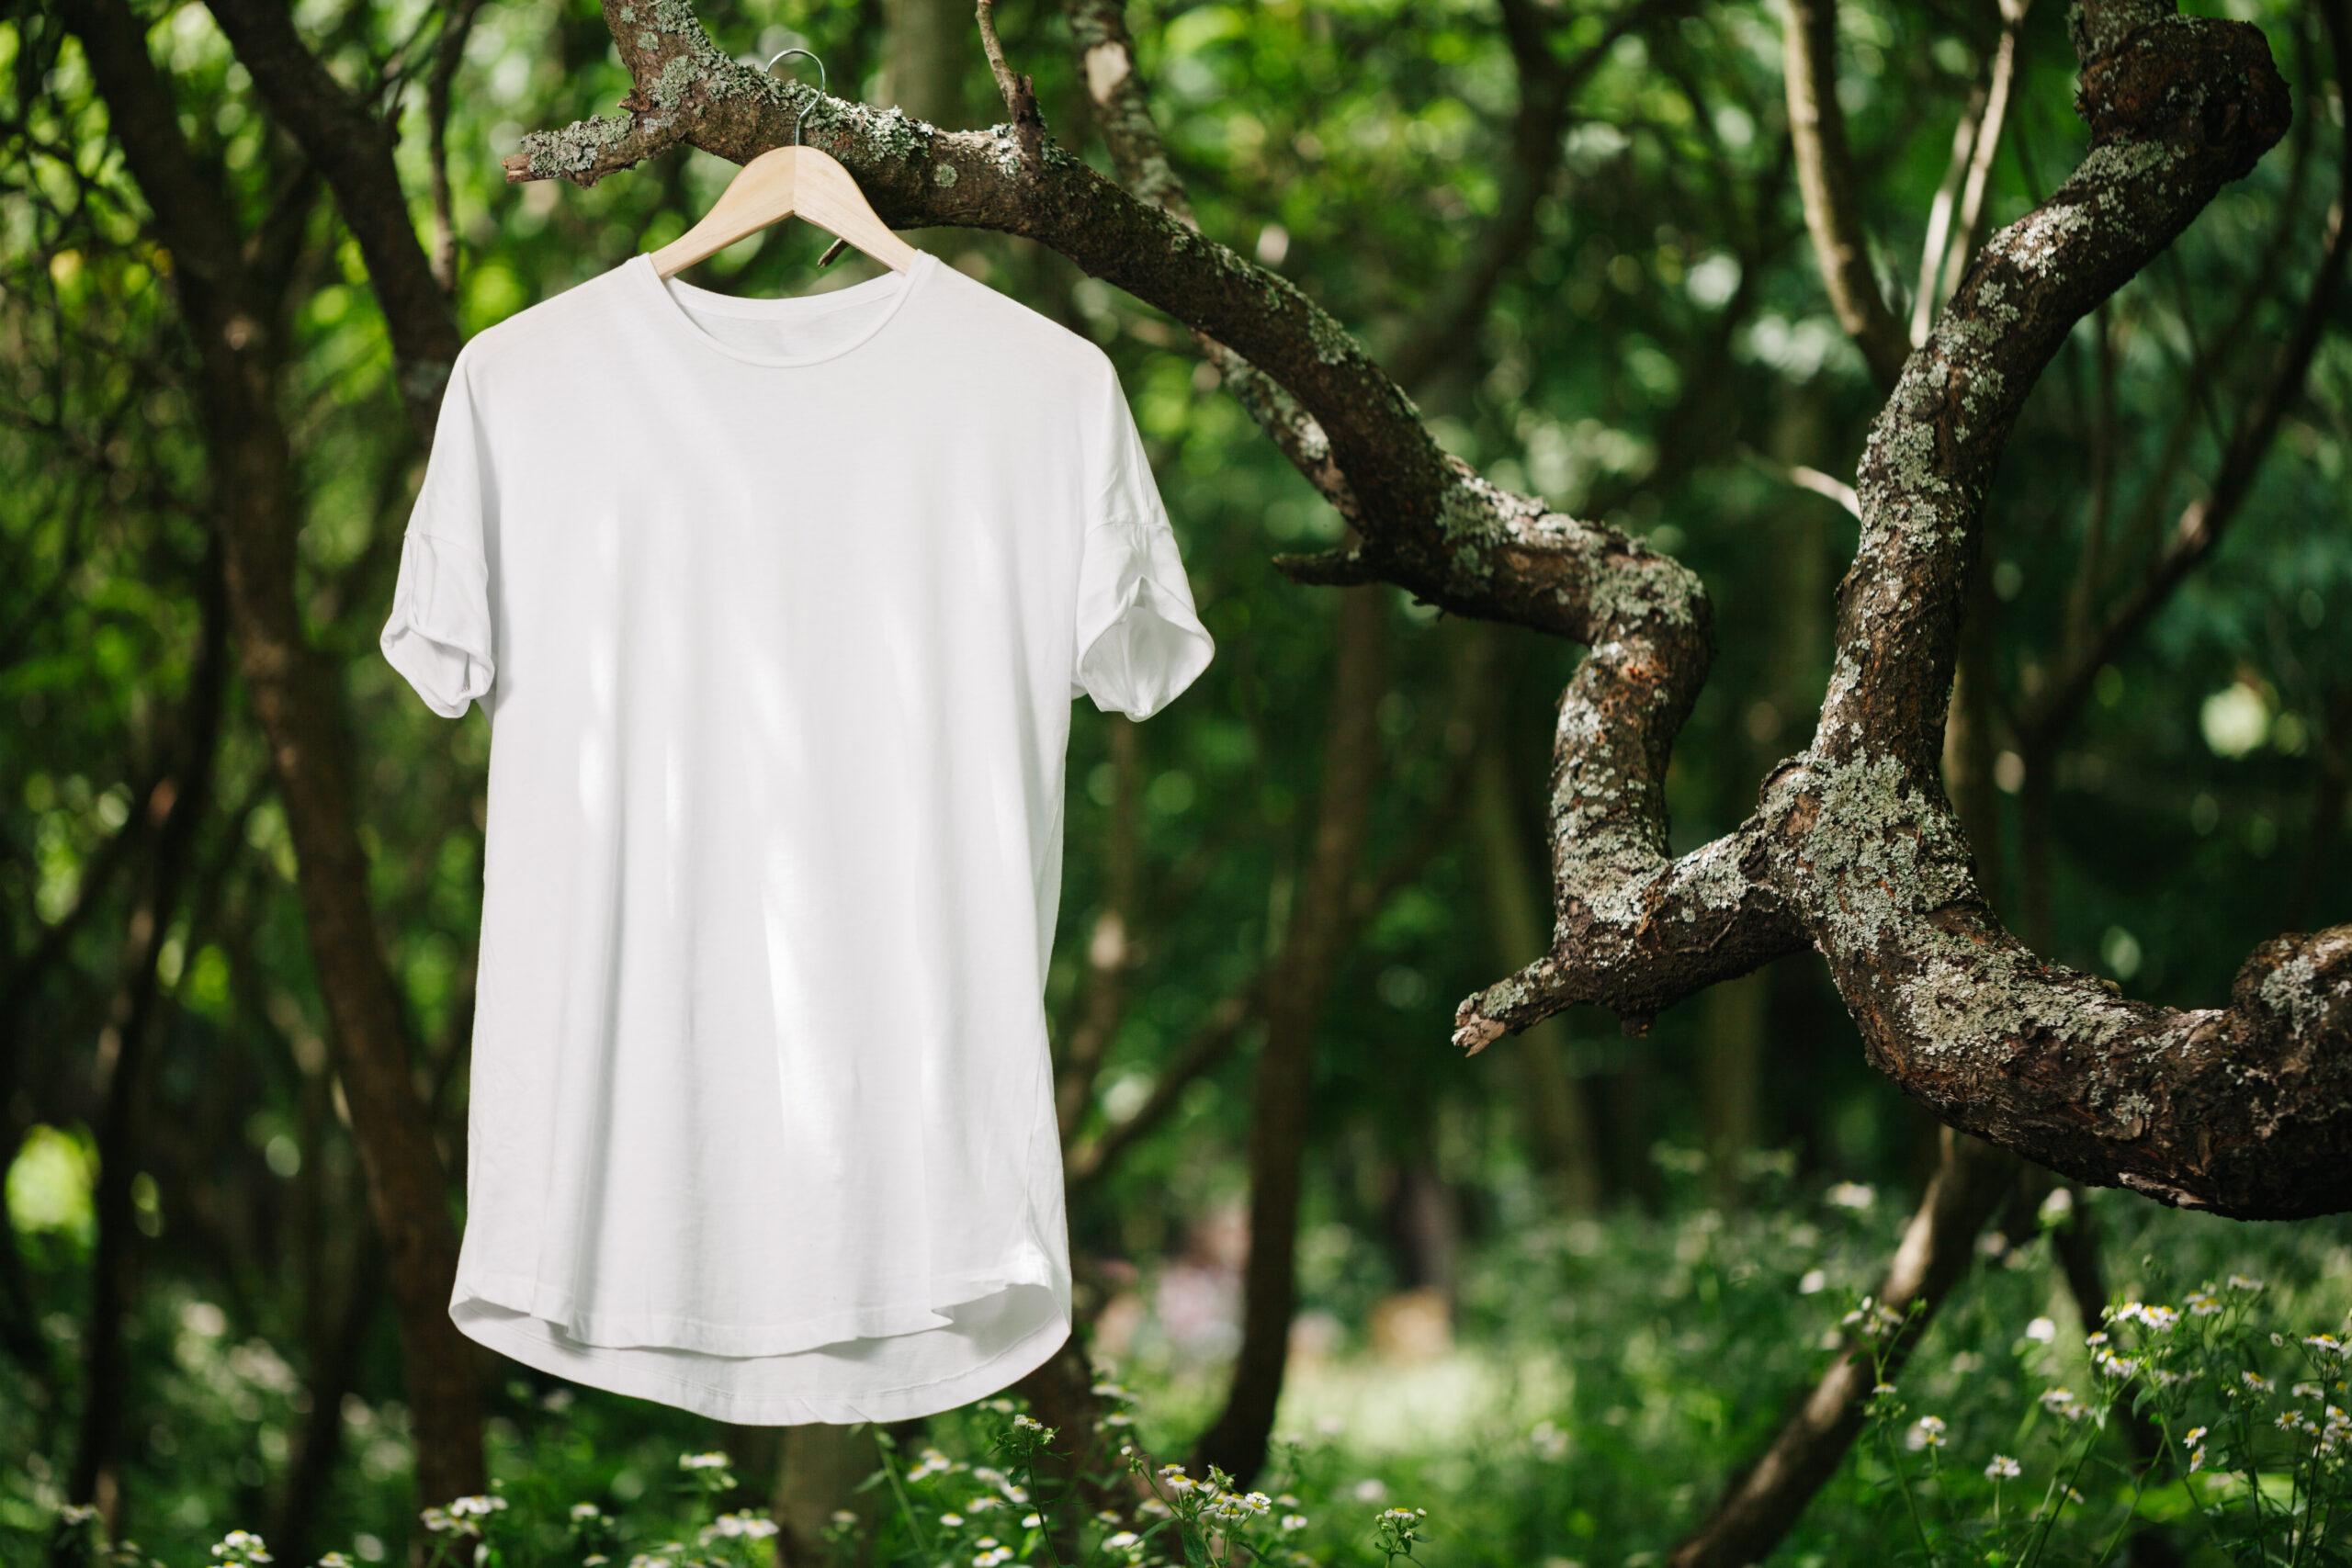 eco friendly t-shirt brands